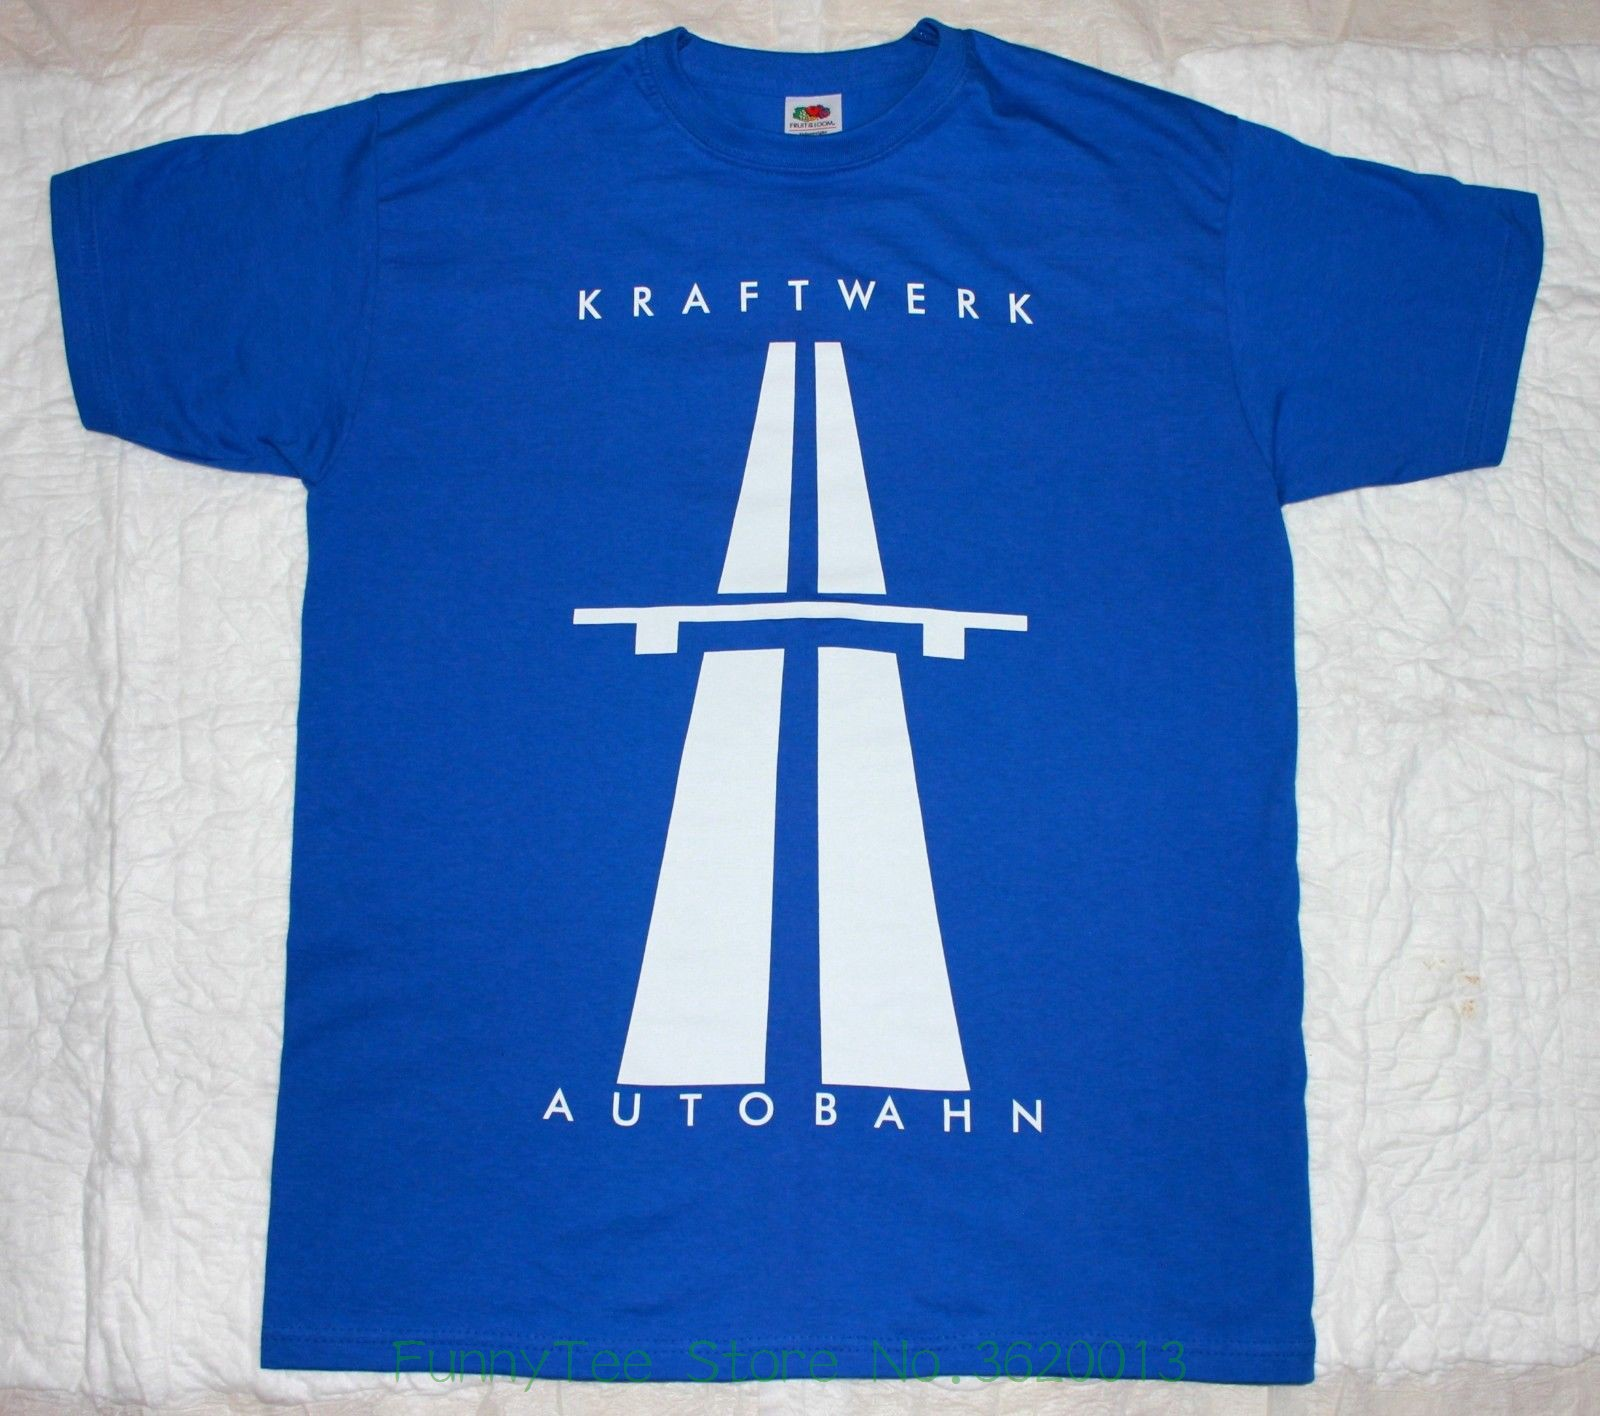 Kraftwerk Autobahn&#039 ; 74 Krautrock Electronic Synthrock Royal Blue T-shirt